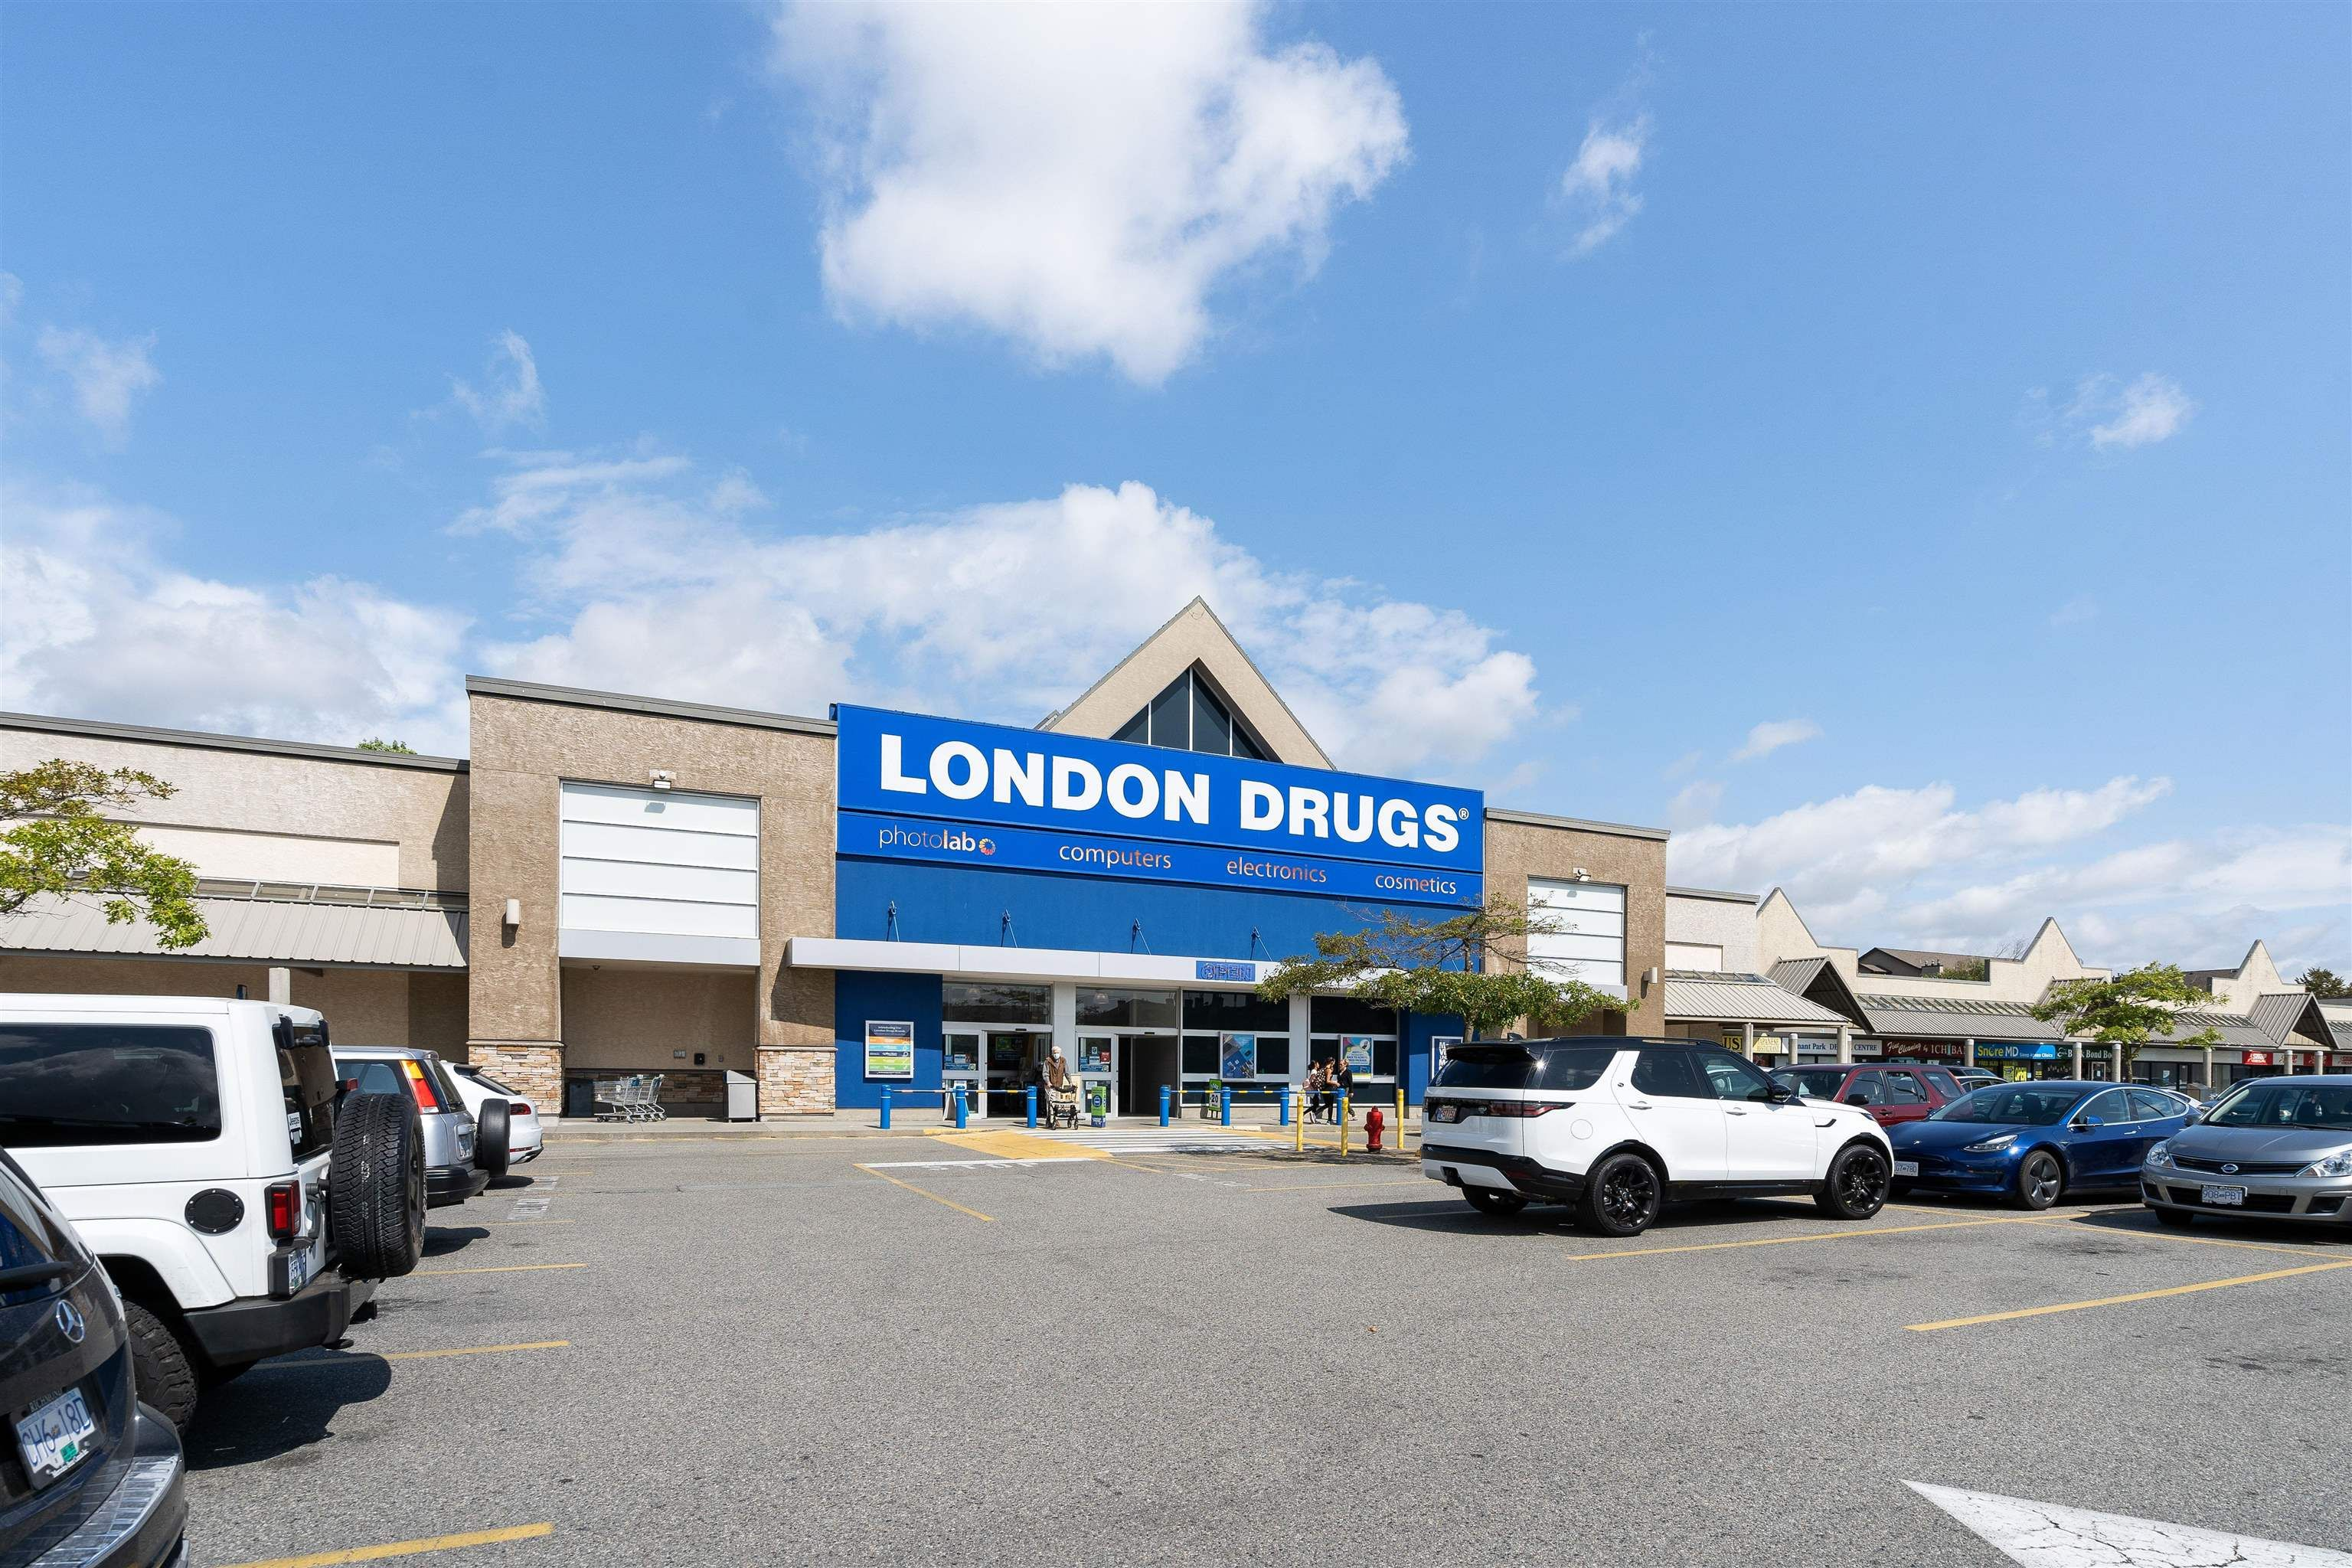 Photo 22: Photos: B204 4821 53 STREET in Delta: Hawthorne Condo for sale (Ladner)  : MLS®# R2611063